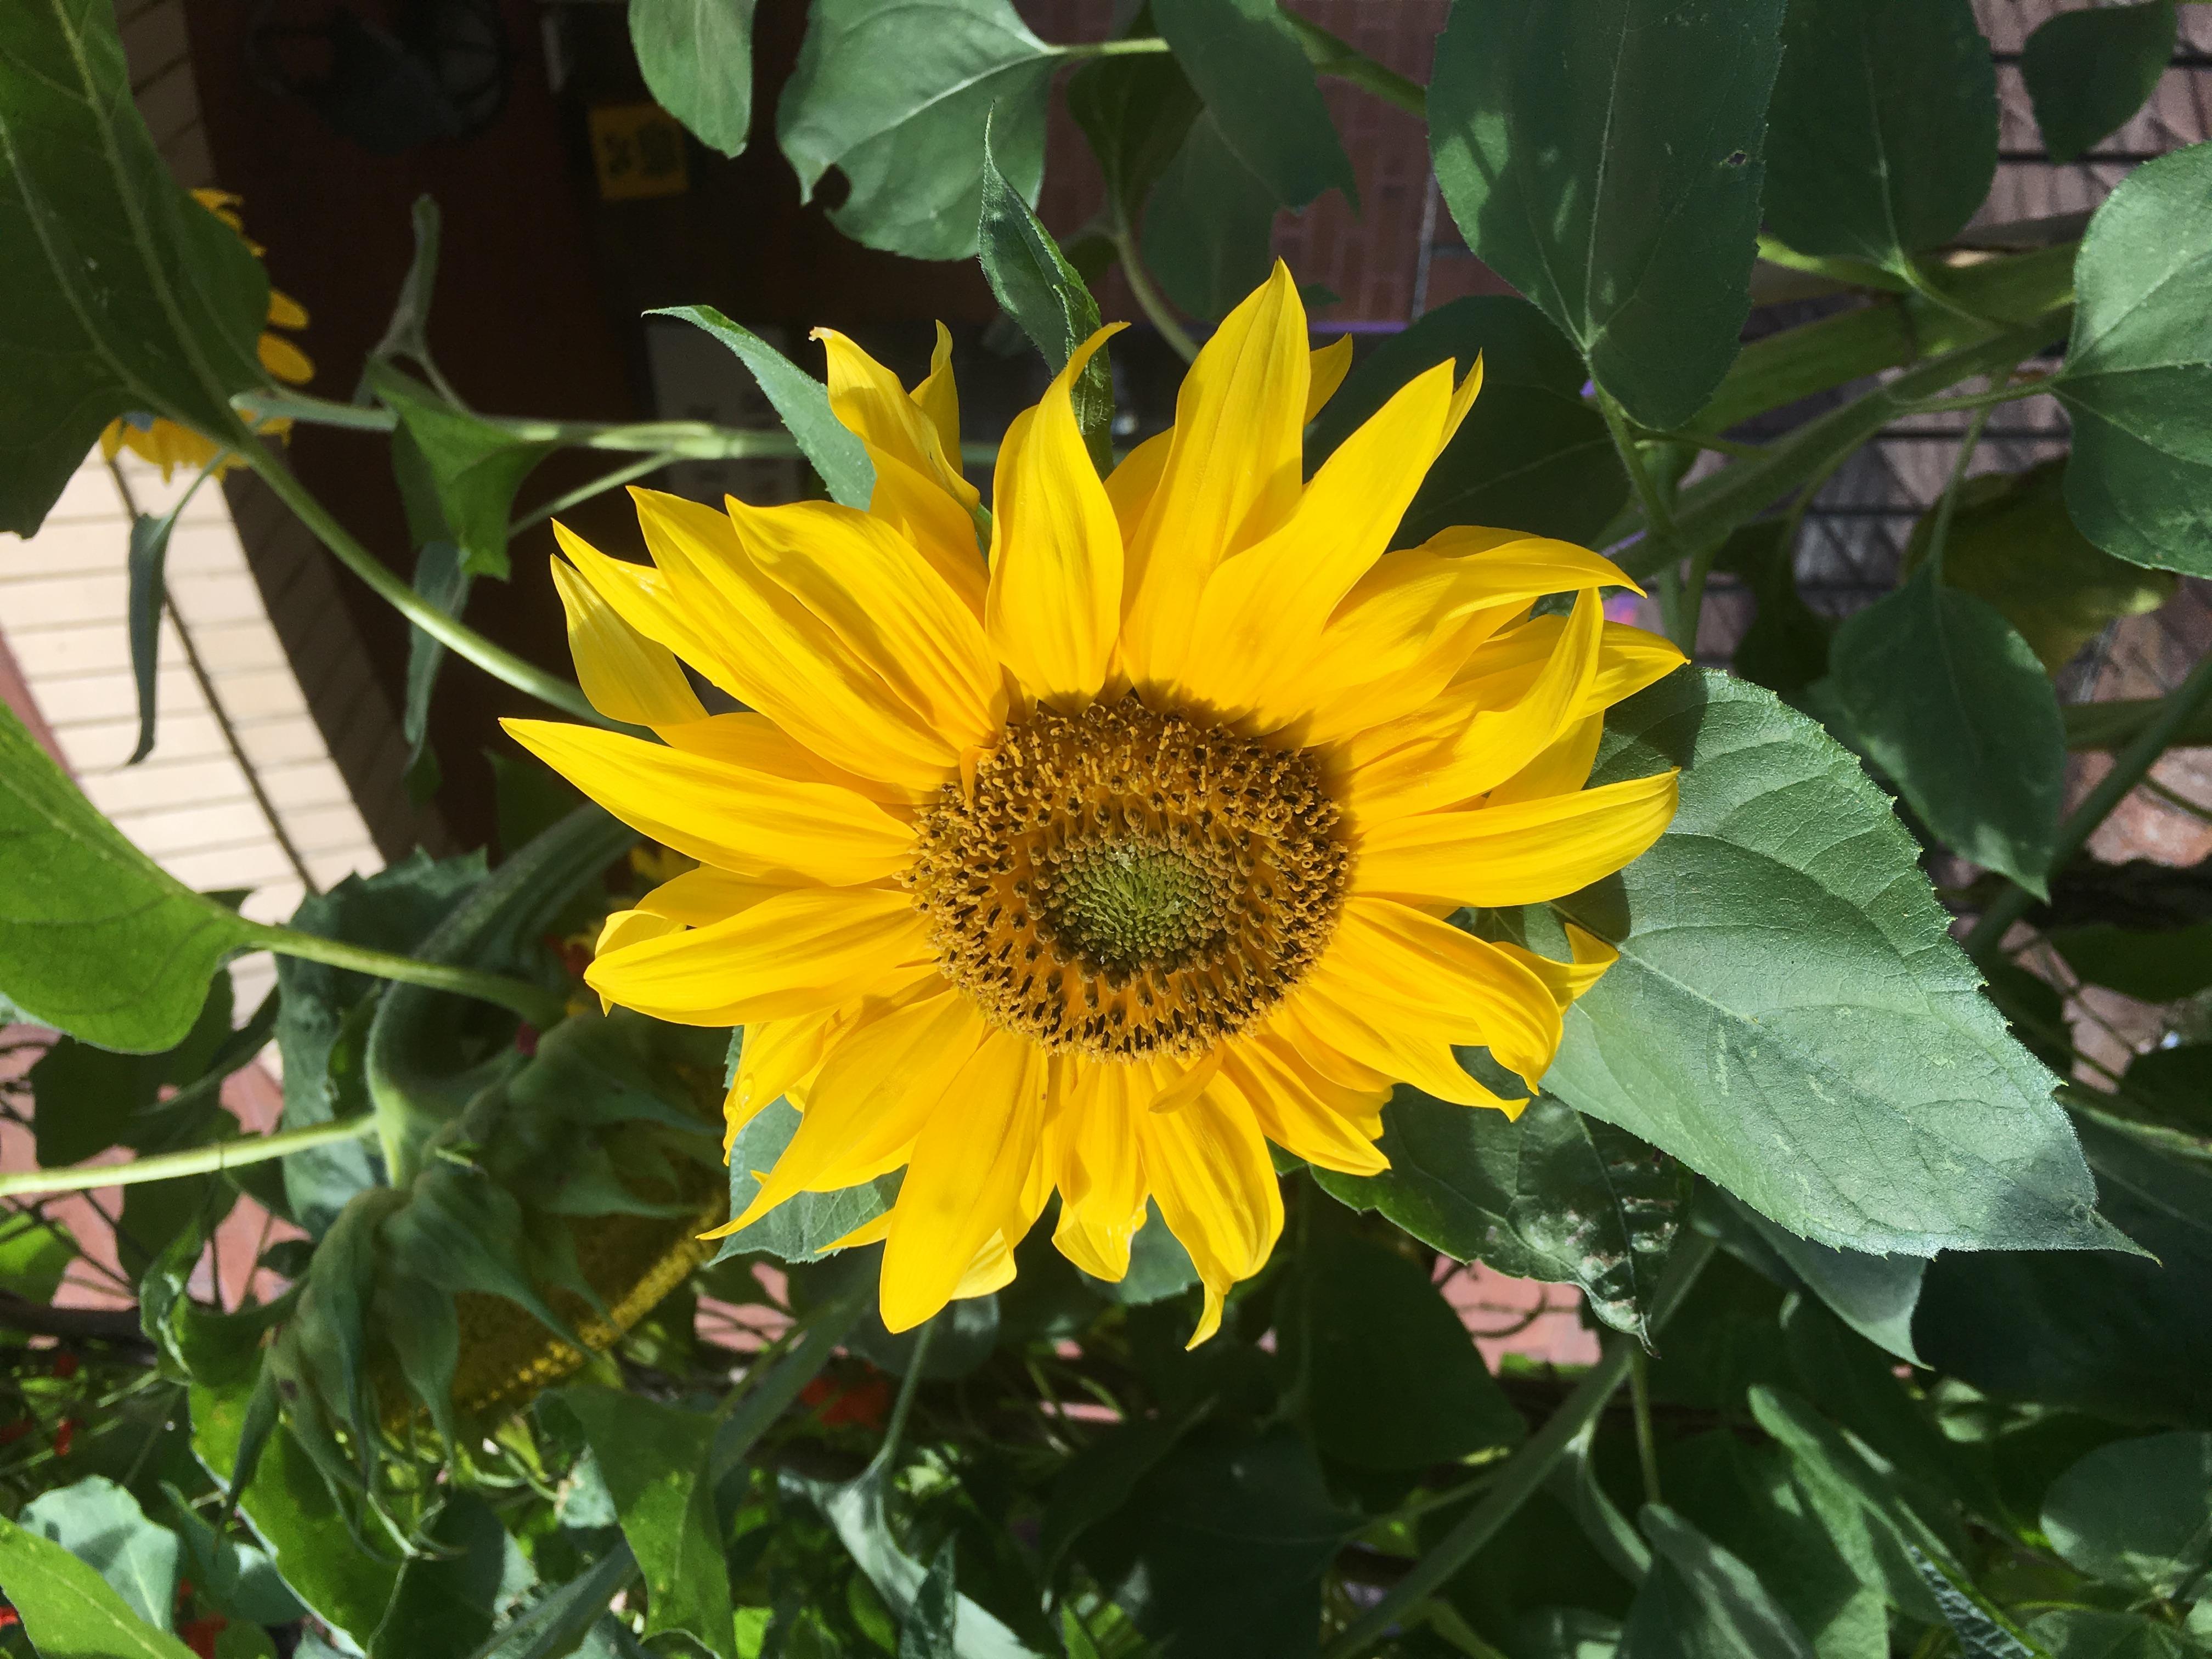 Link Road sunflower in flower